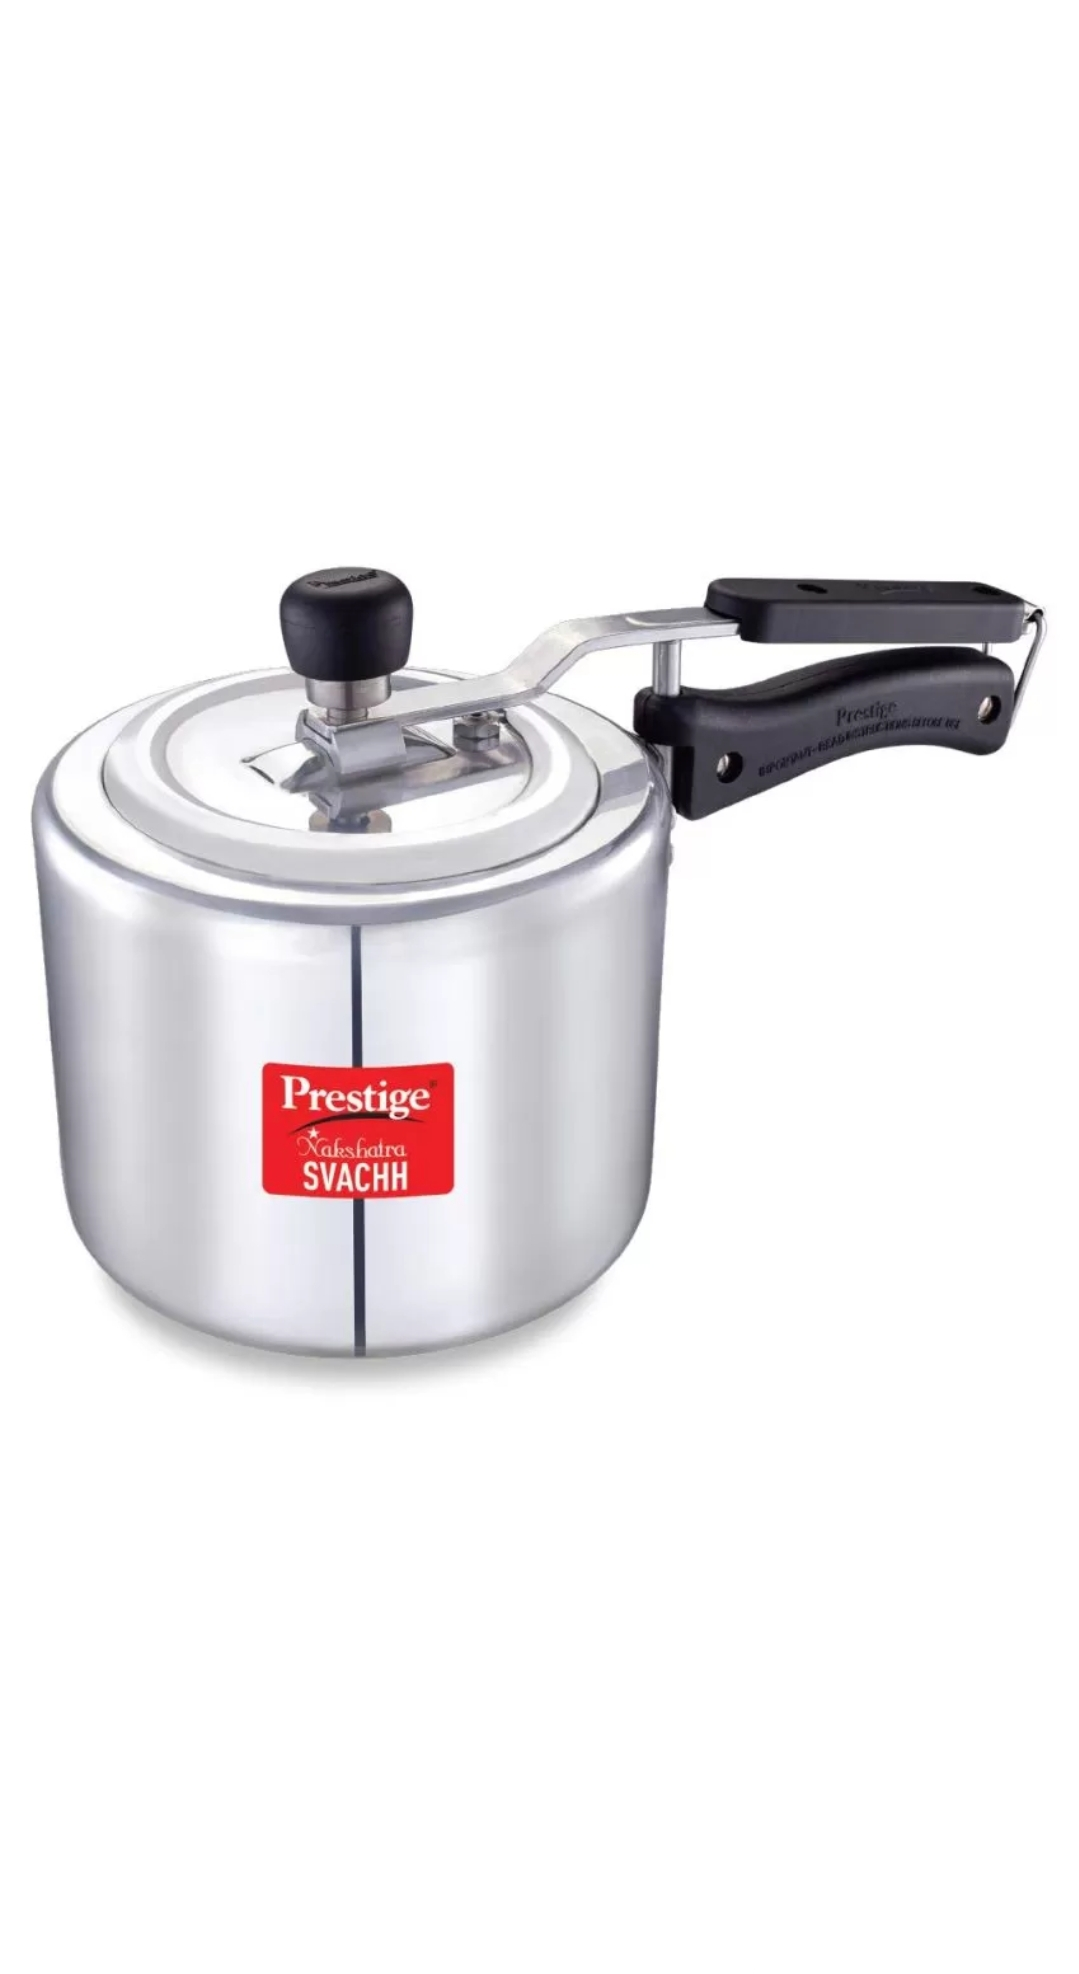 Prestige 3 L Aluminium InnerLid Pressure Cooker Gas Stovetop Compatible